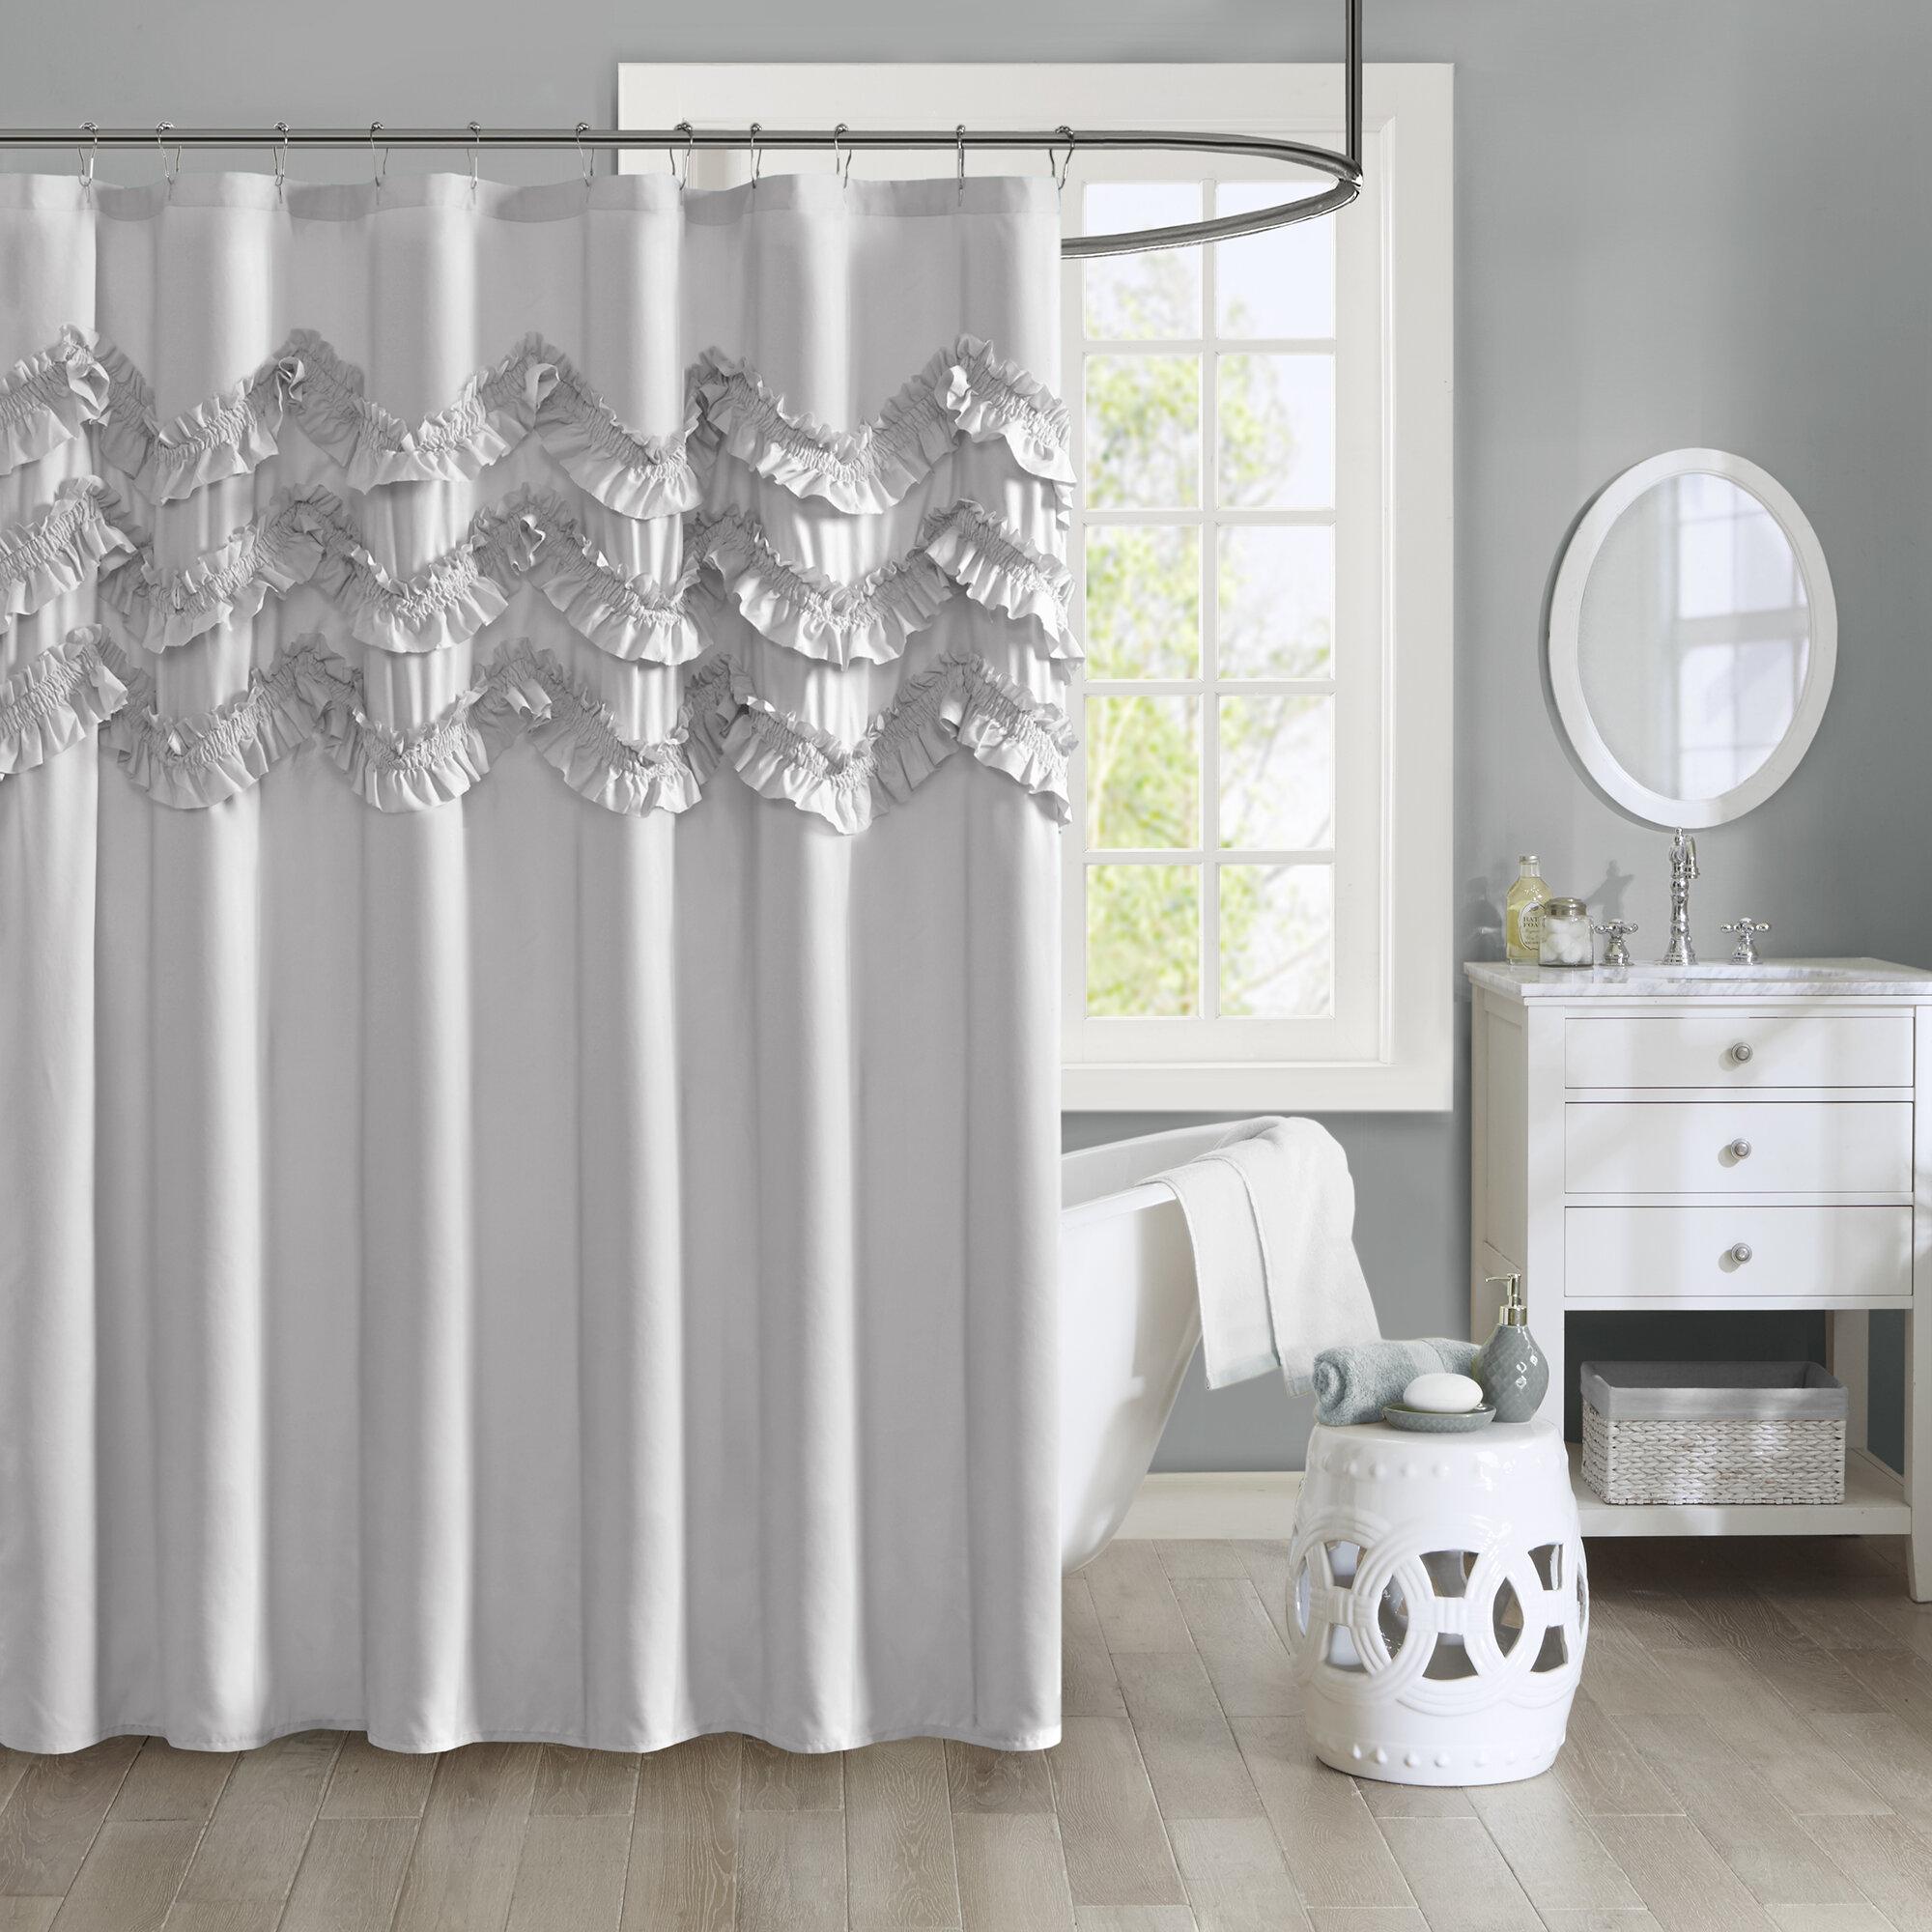 Avrah Ruffle Microfiber Single Shower Curtain Reviews